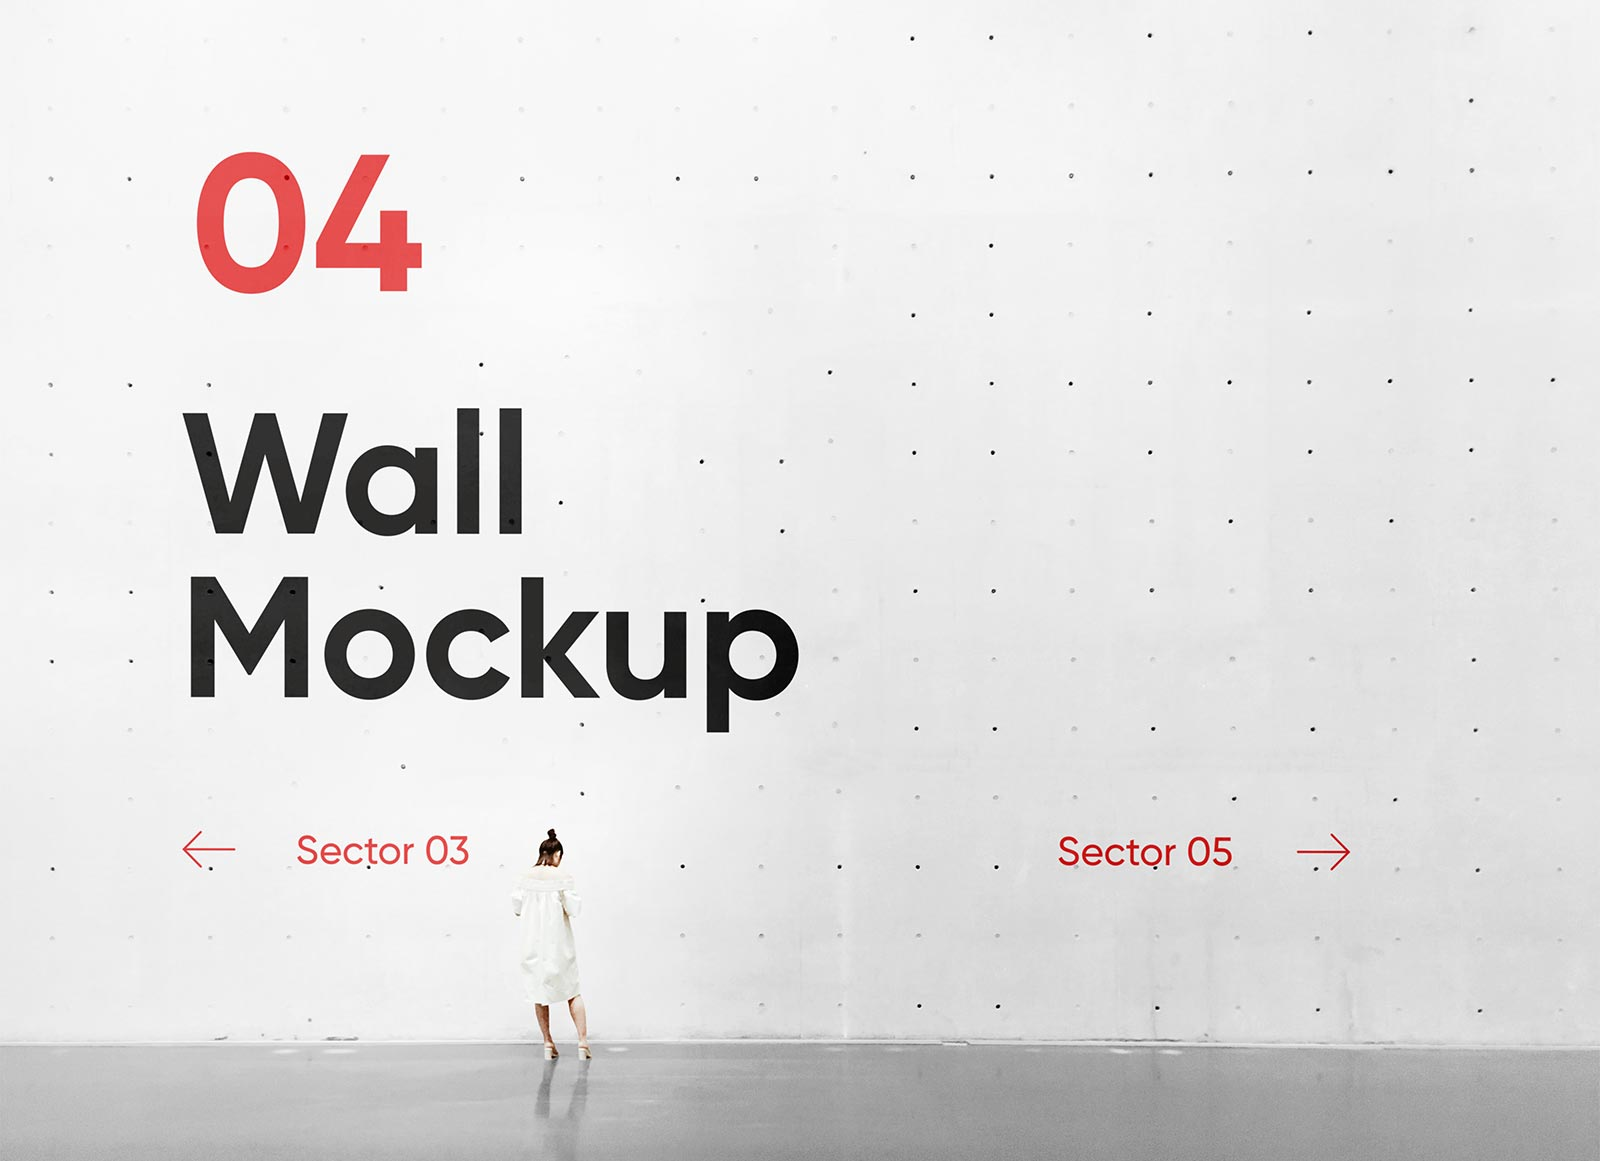 Free-Concrete-Wall-Mockup-PSD